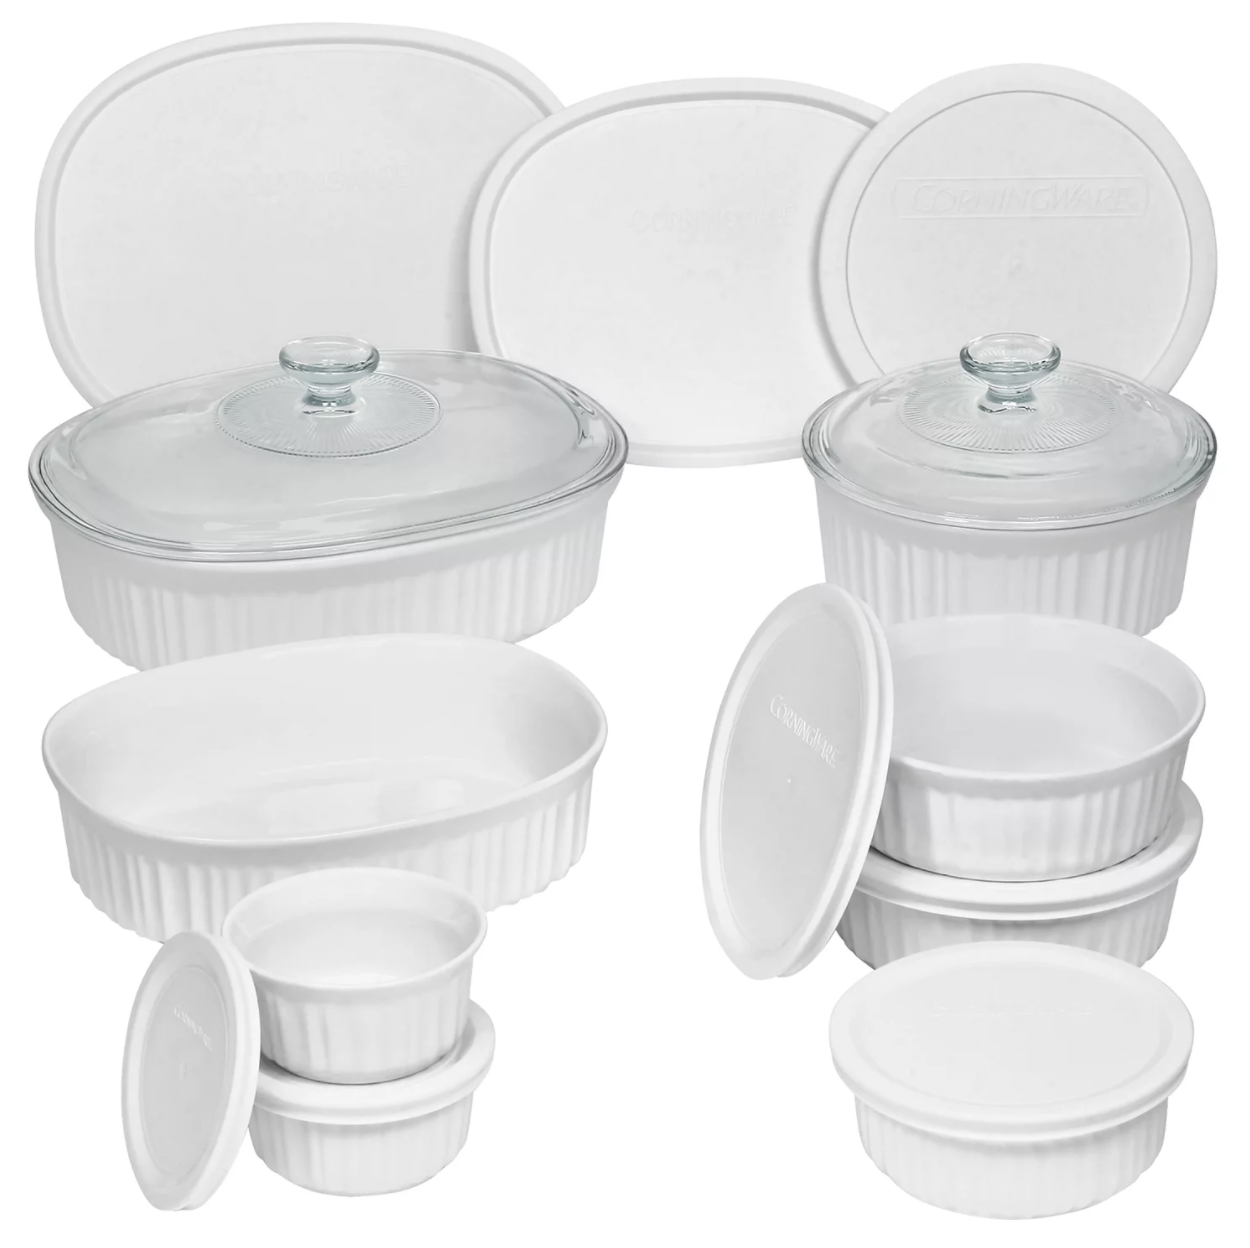 the 18 piece corningware set